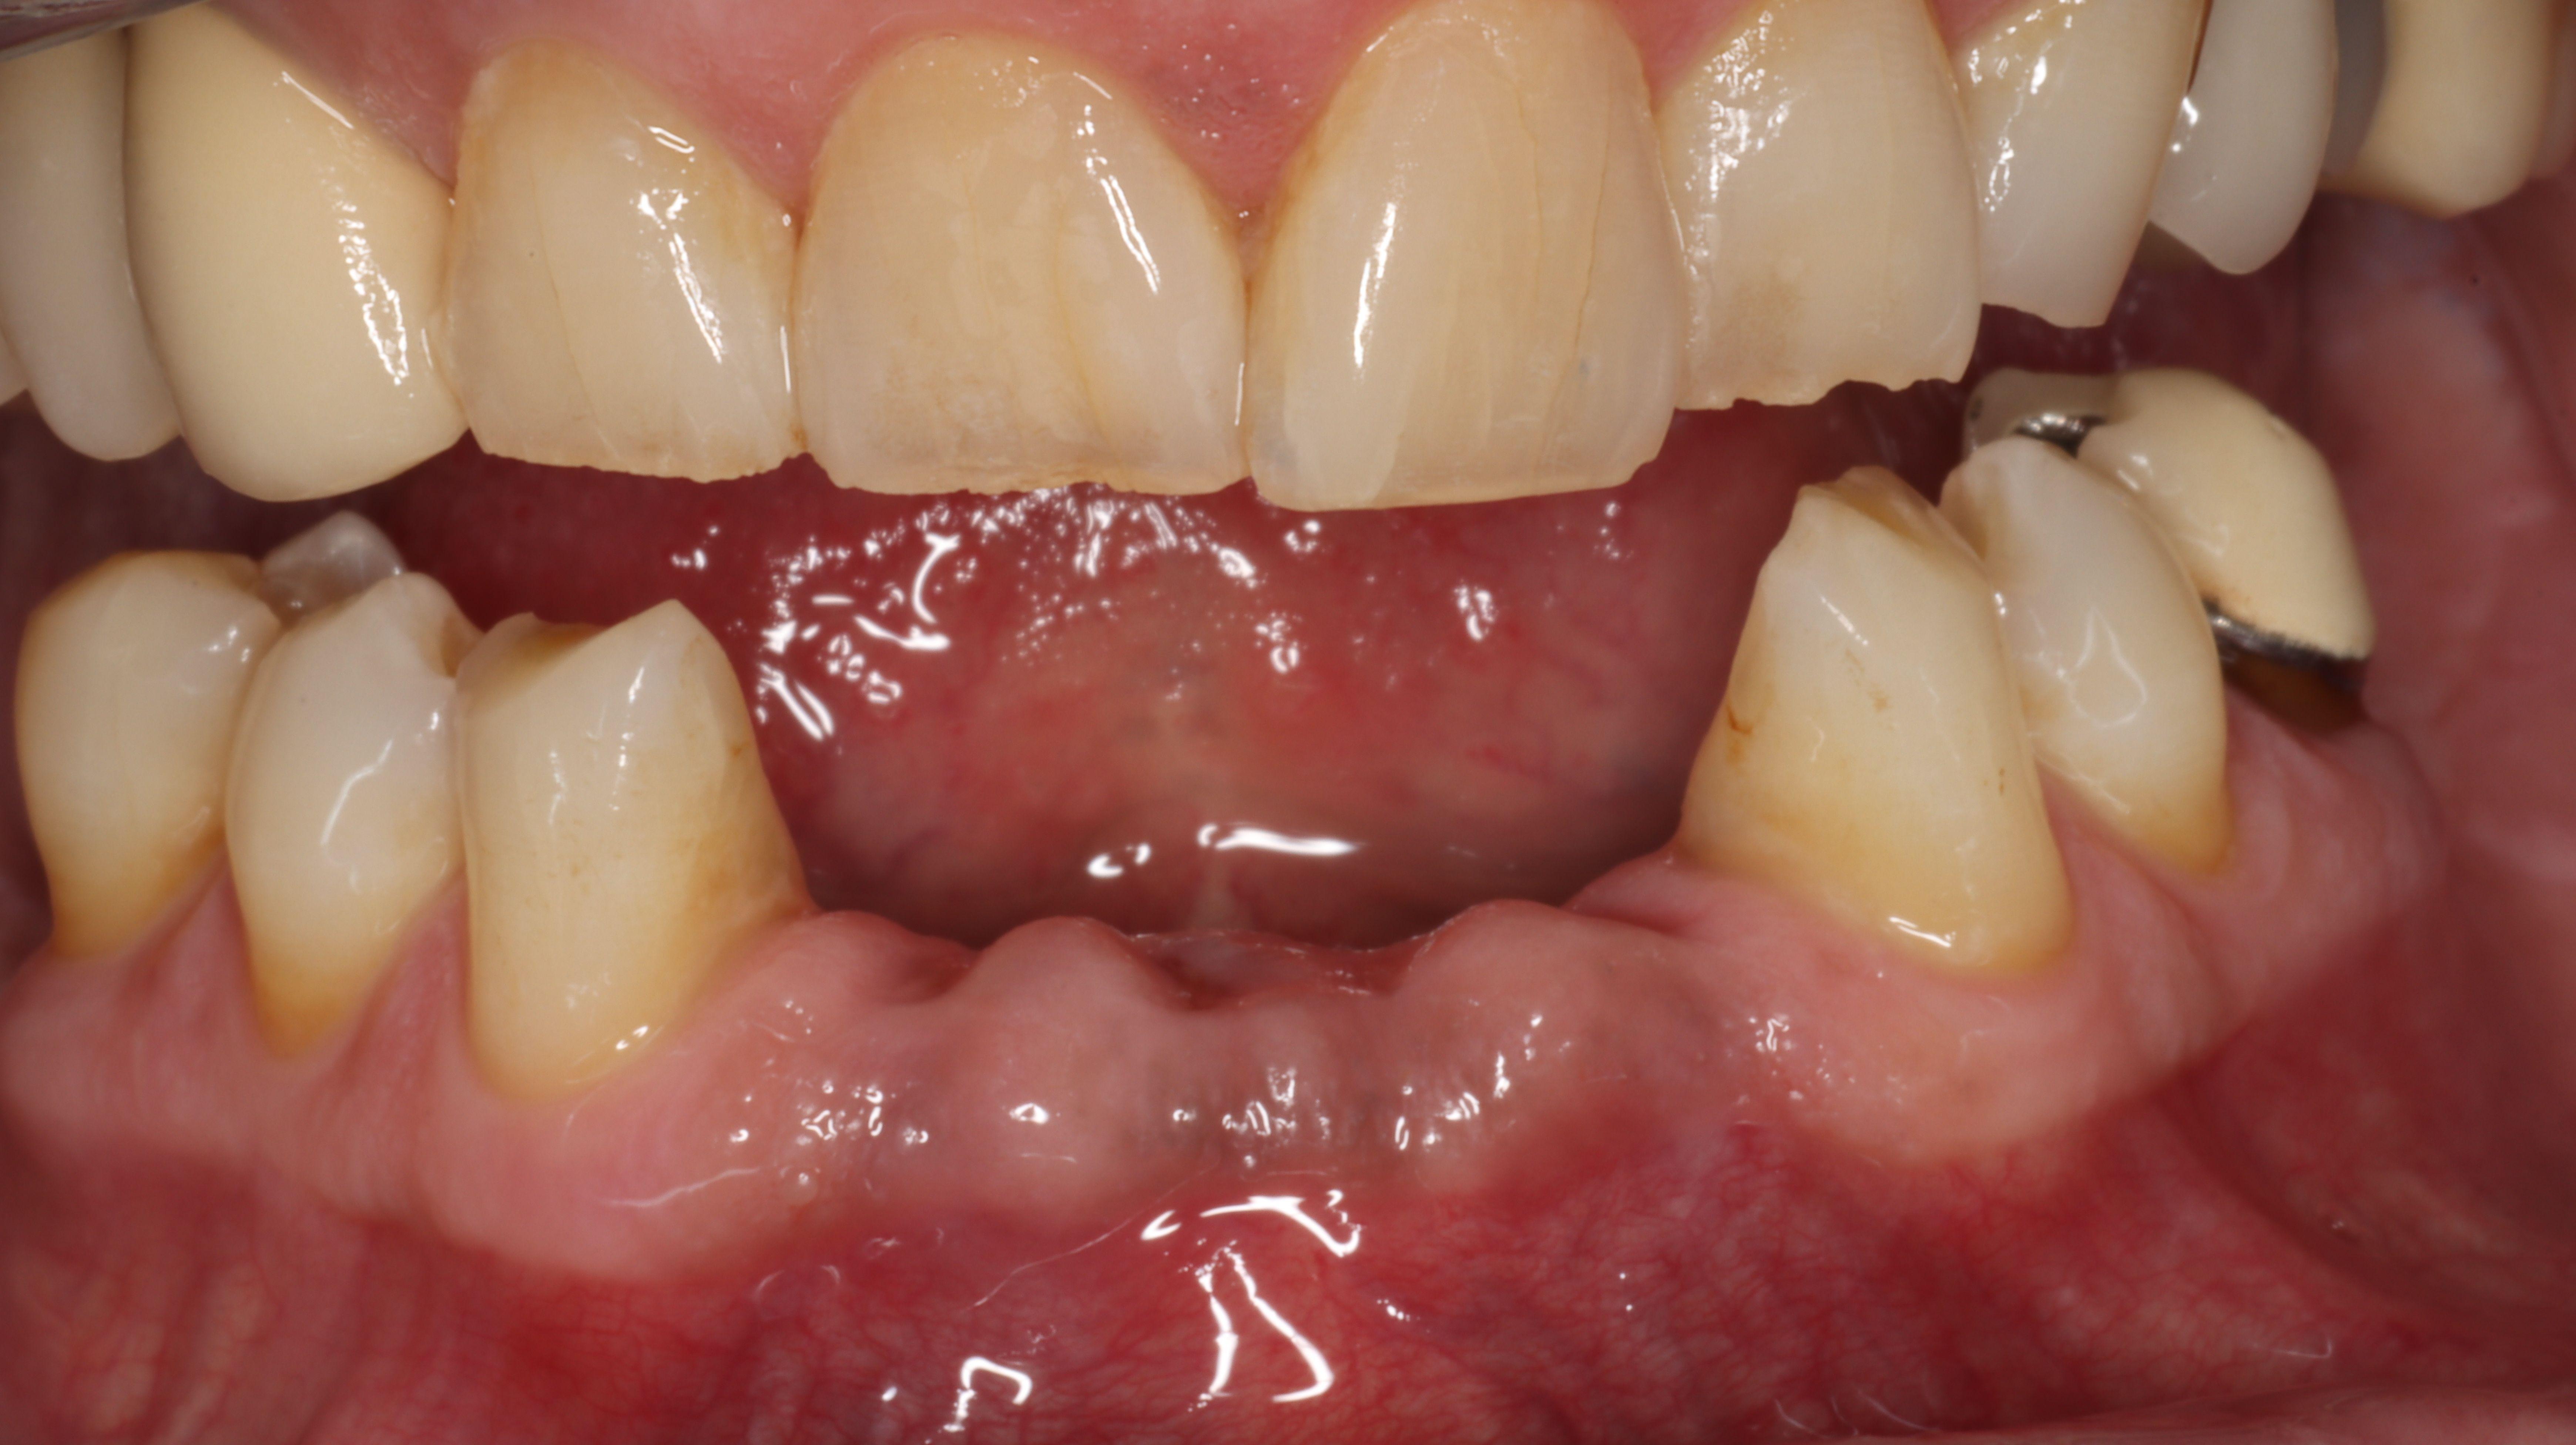 Figure 3. Four weeks post-extractions of mandibular incisors. Begin RPD fabrication